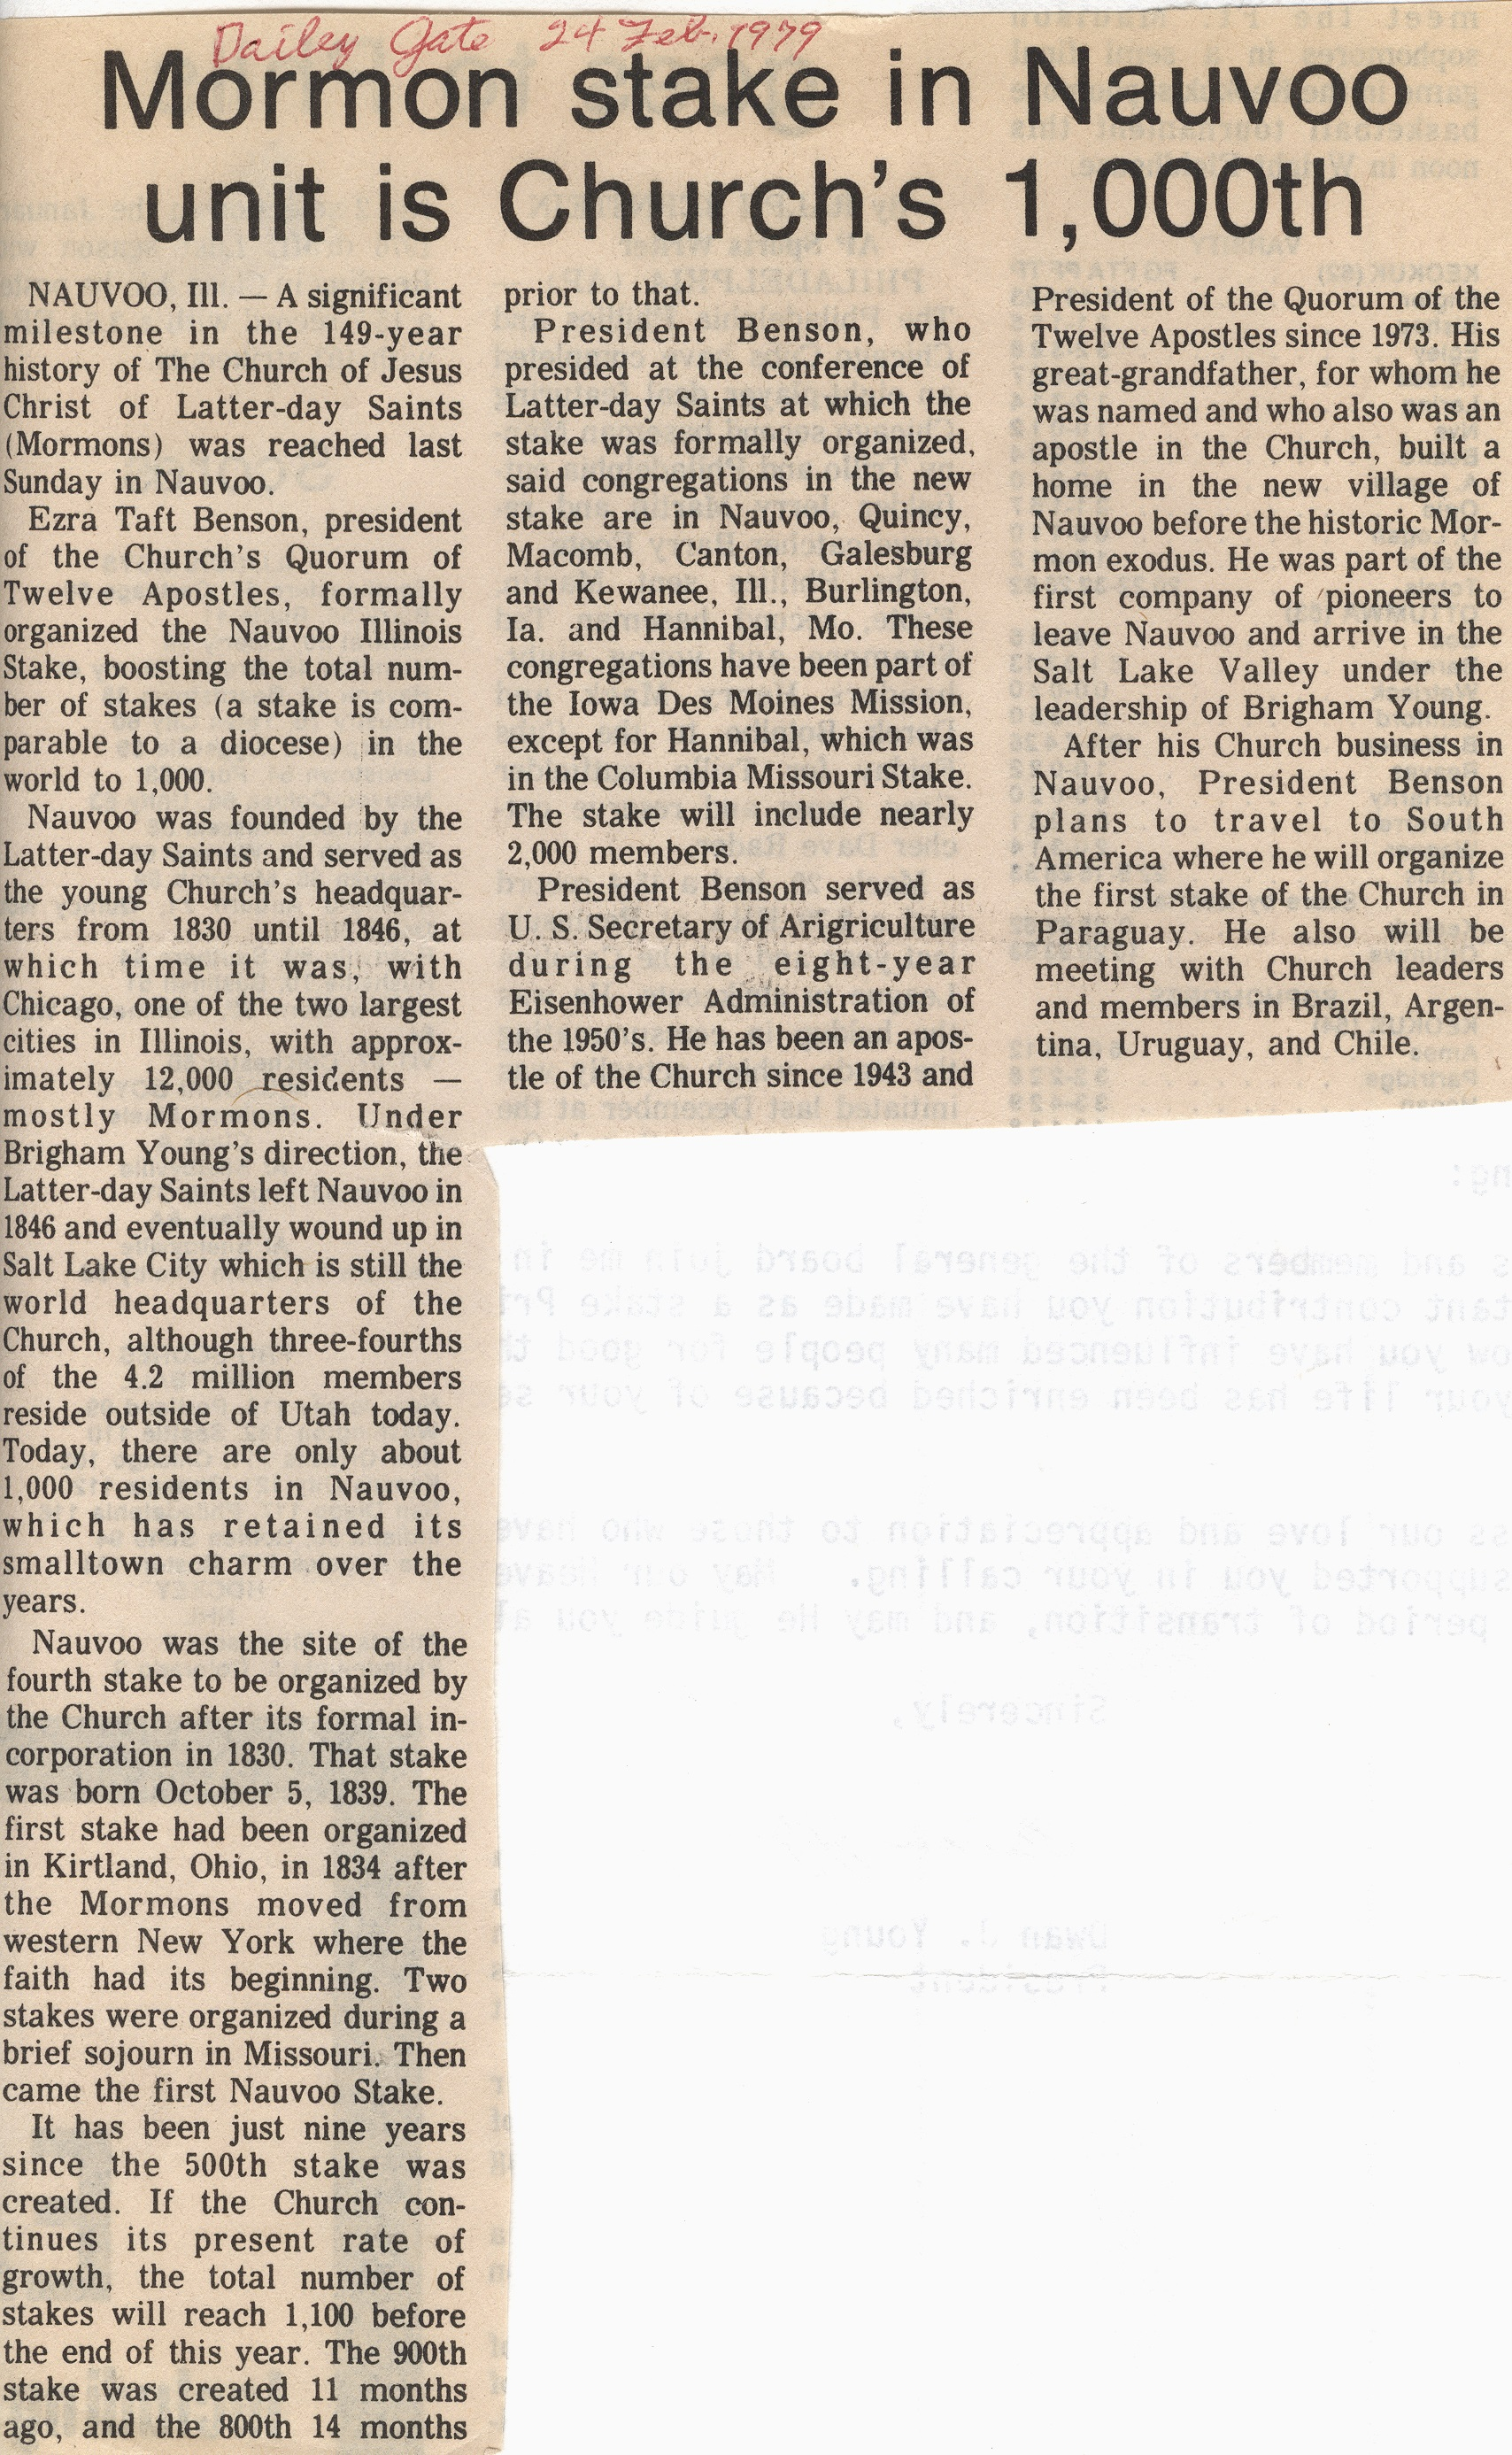 Newspaper Daily Gate City 24 February 1979.jpg